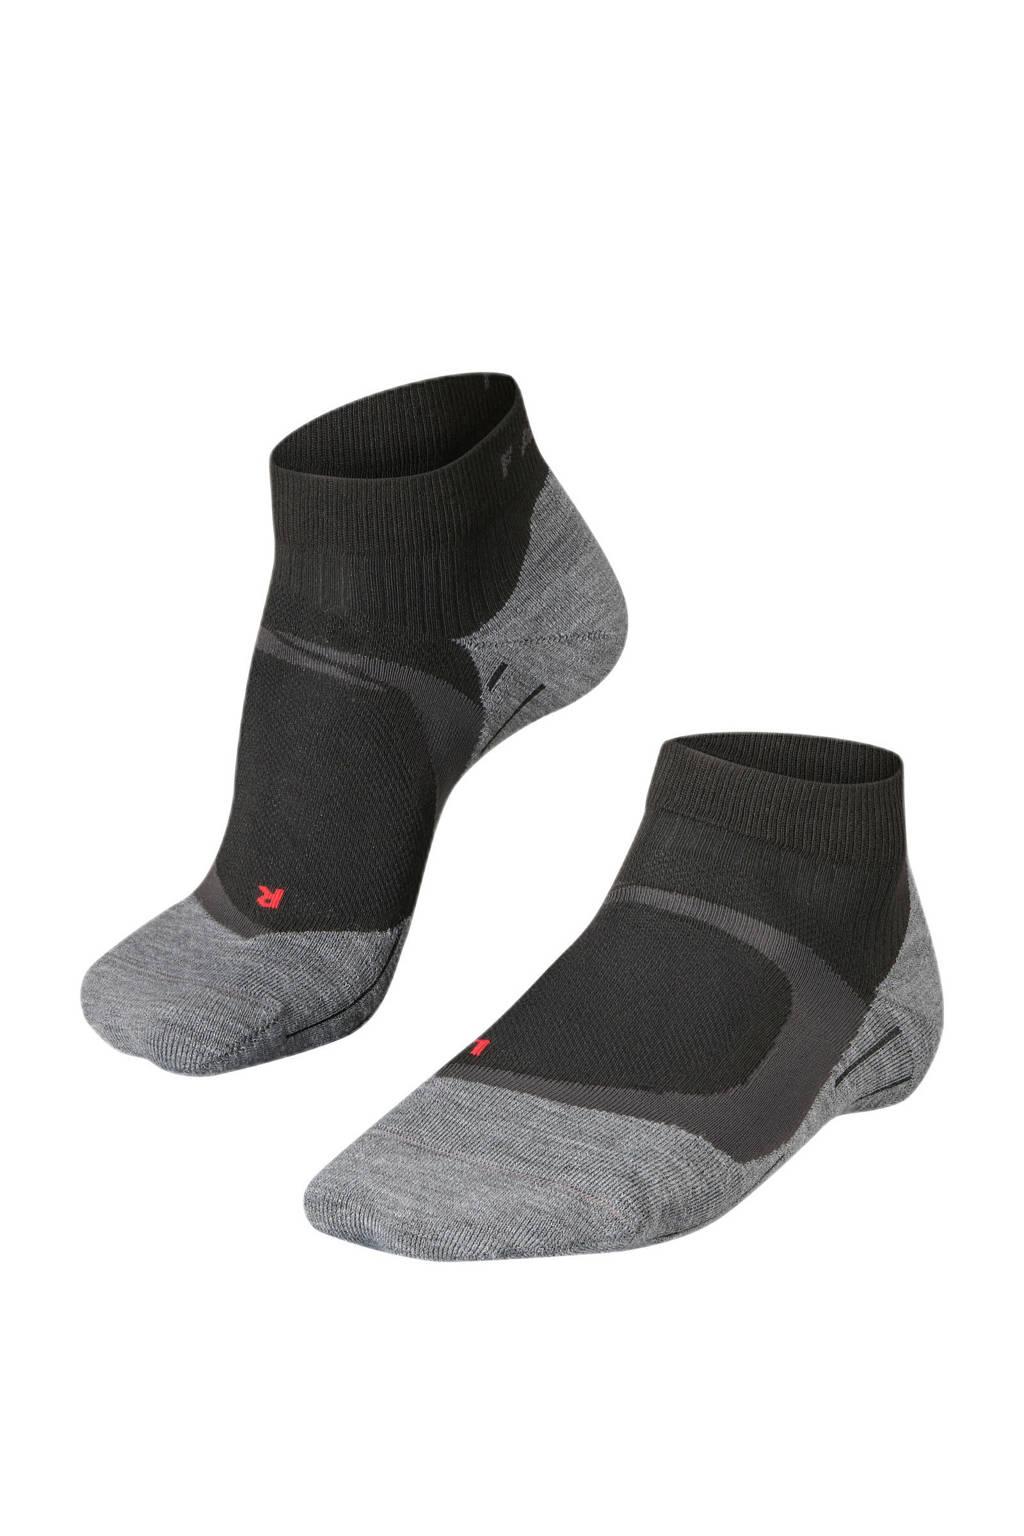 Falke Sport RU4 Cool Short hardloopsokken zwart, Zwart/grijs/rood